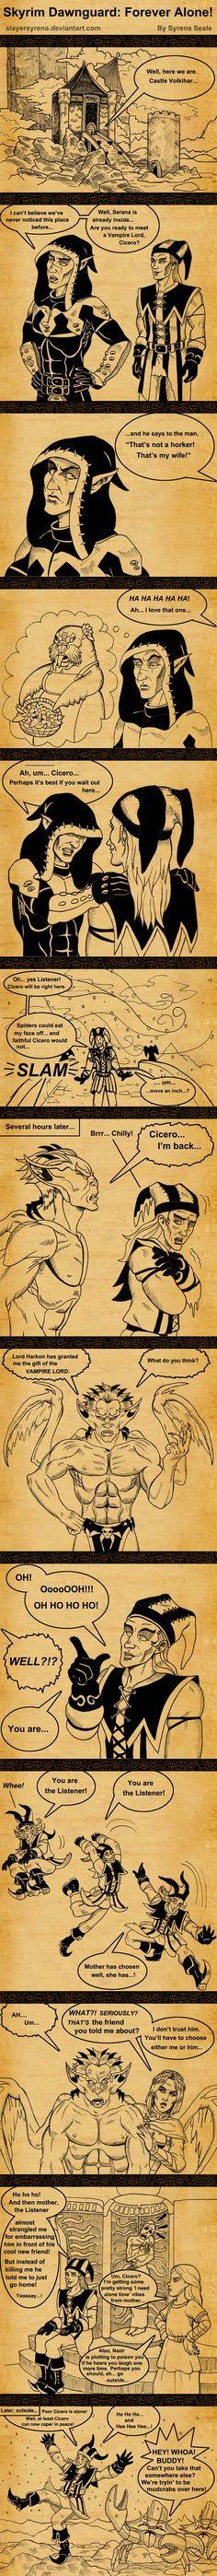 Skyrim Dawnguard: Forever Alone! by SlayerSyrena.deviantart.com on @deviantART